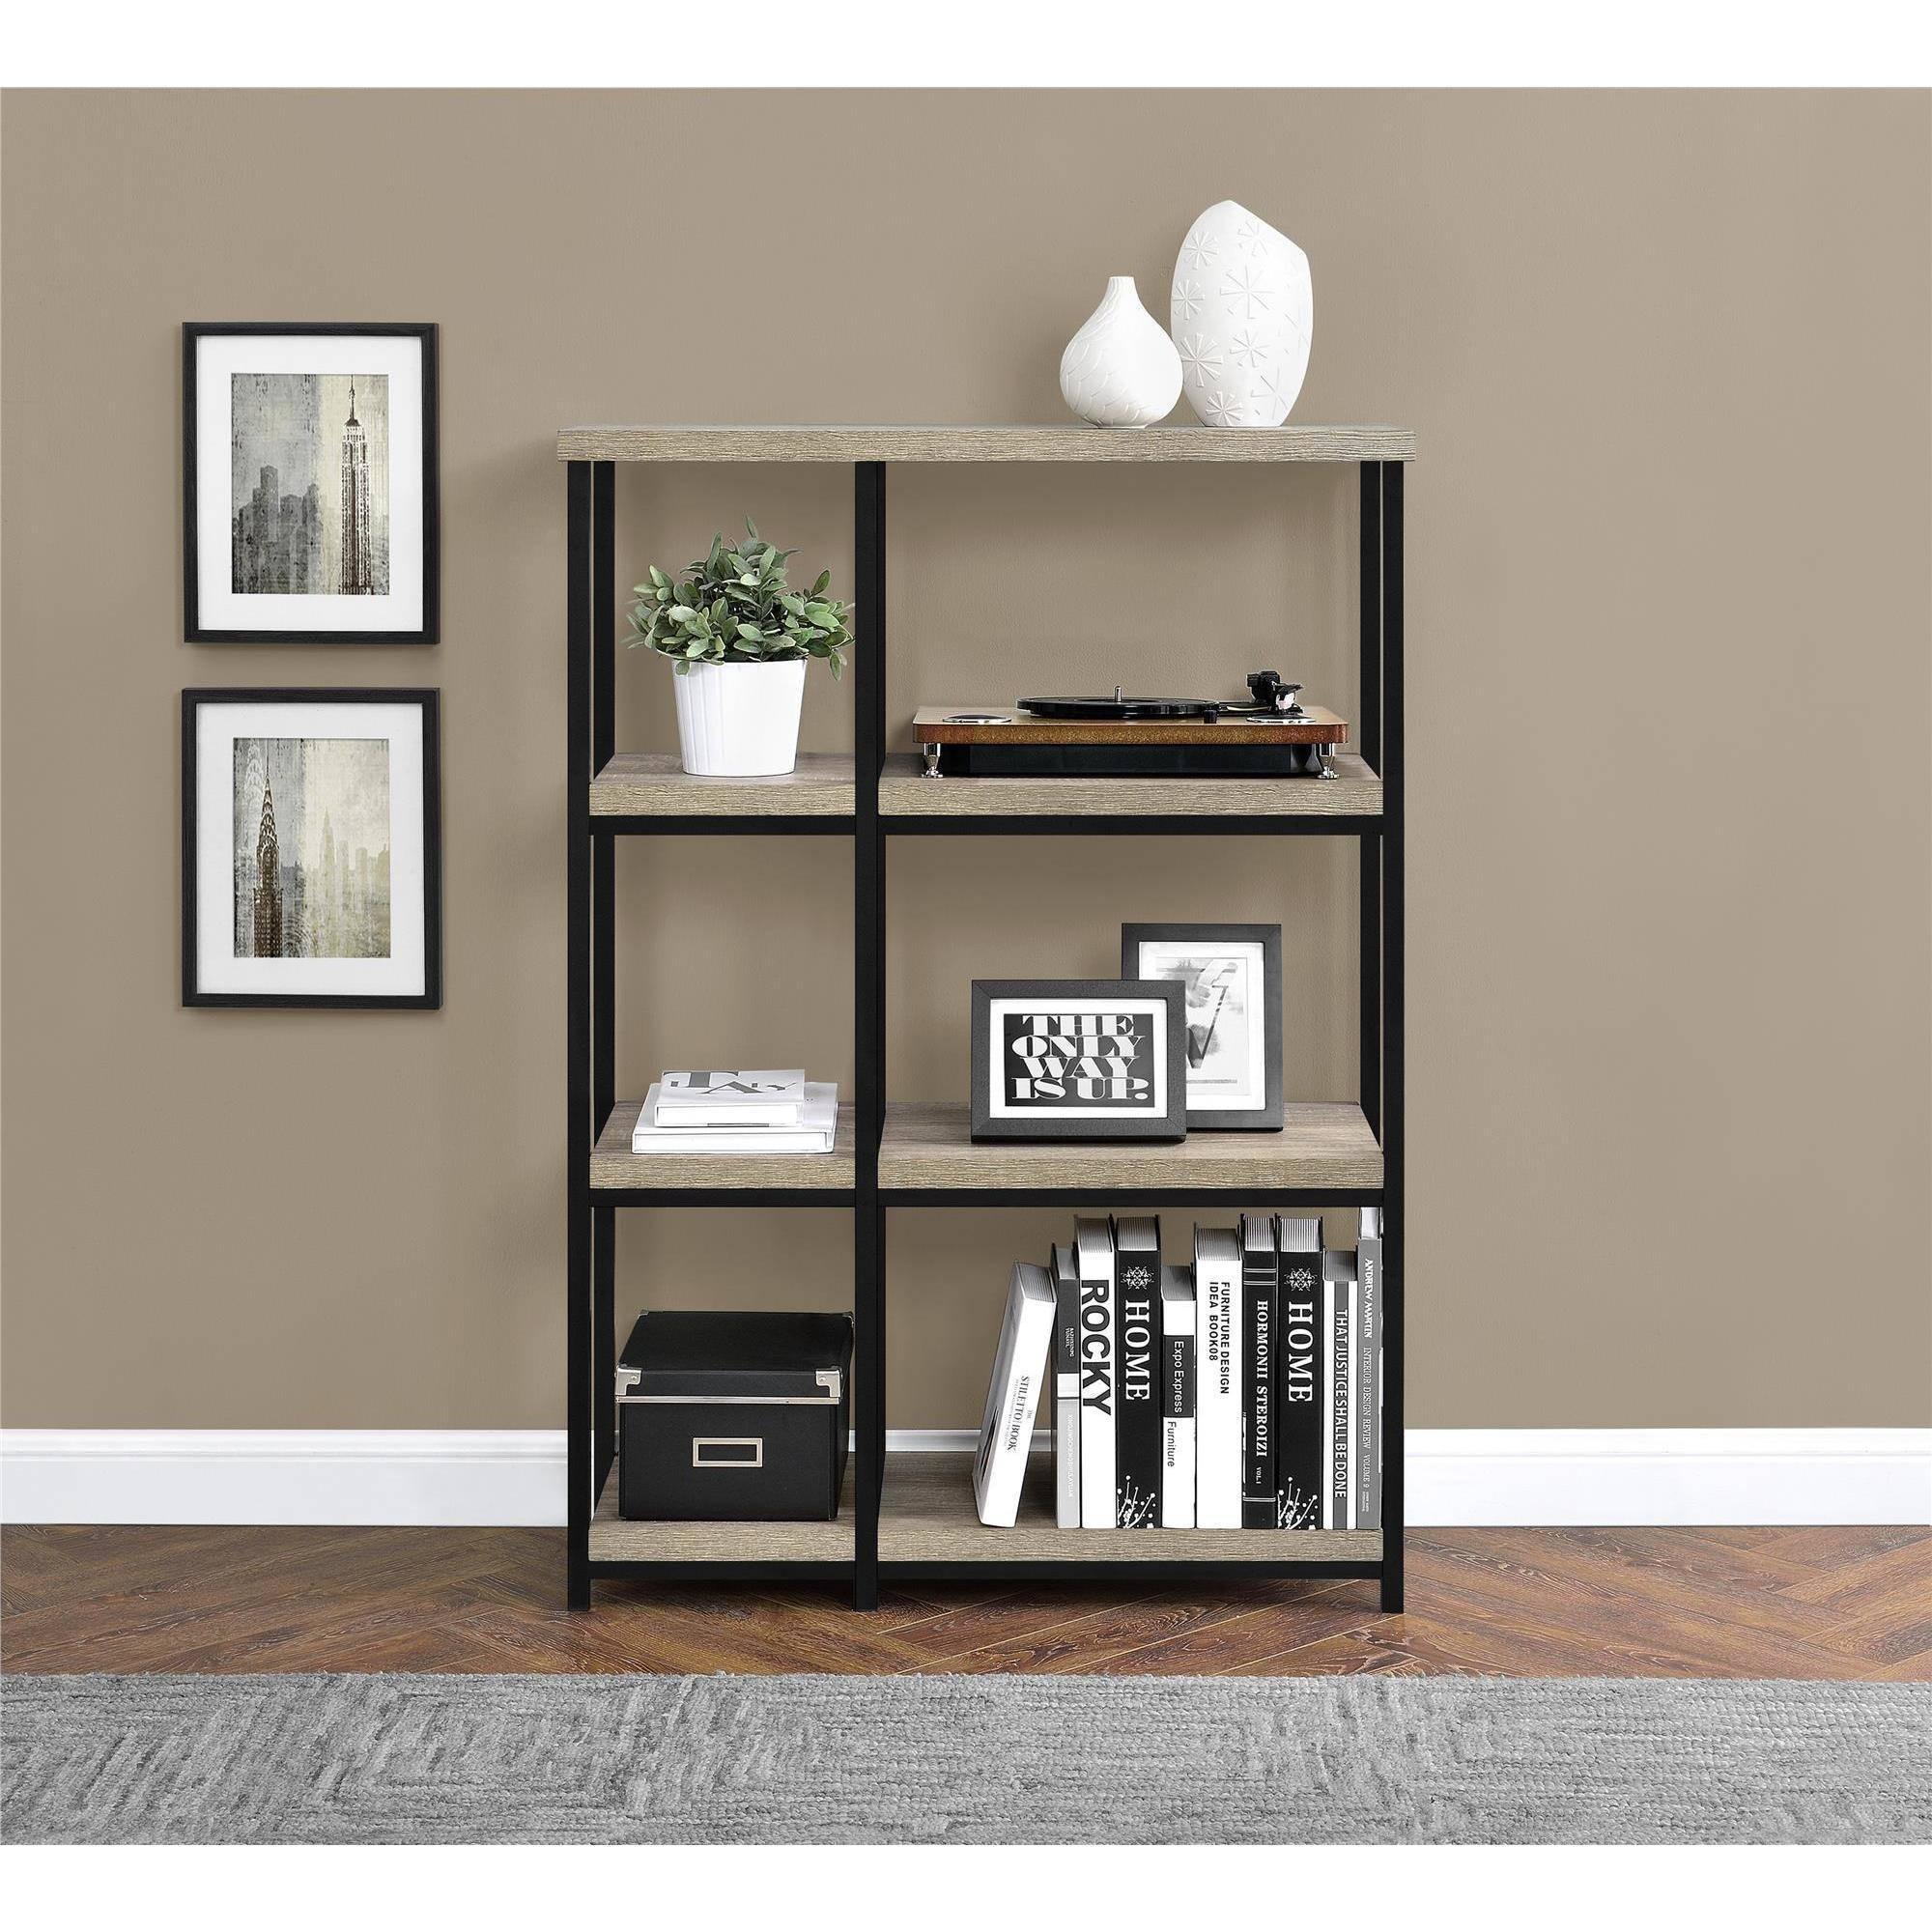 Elmwood BookcaseRoom Divider Sonoma Oak Walmartcom